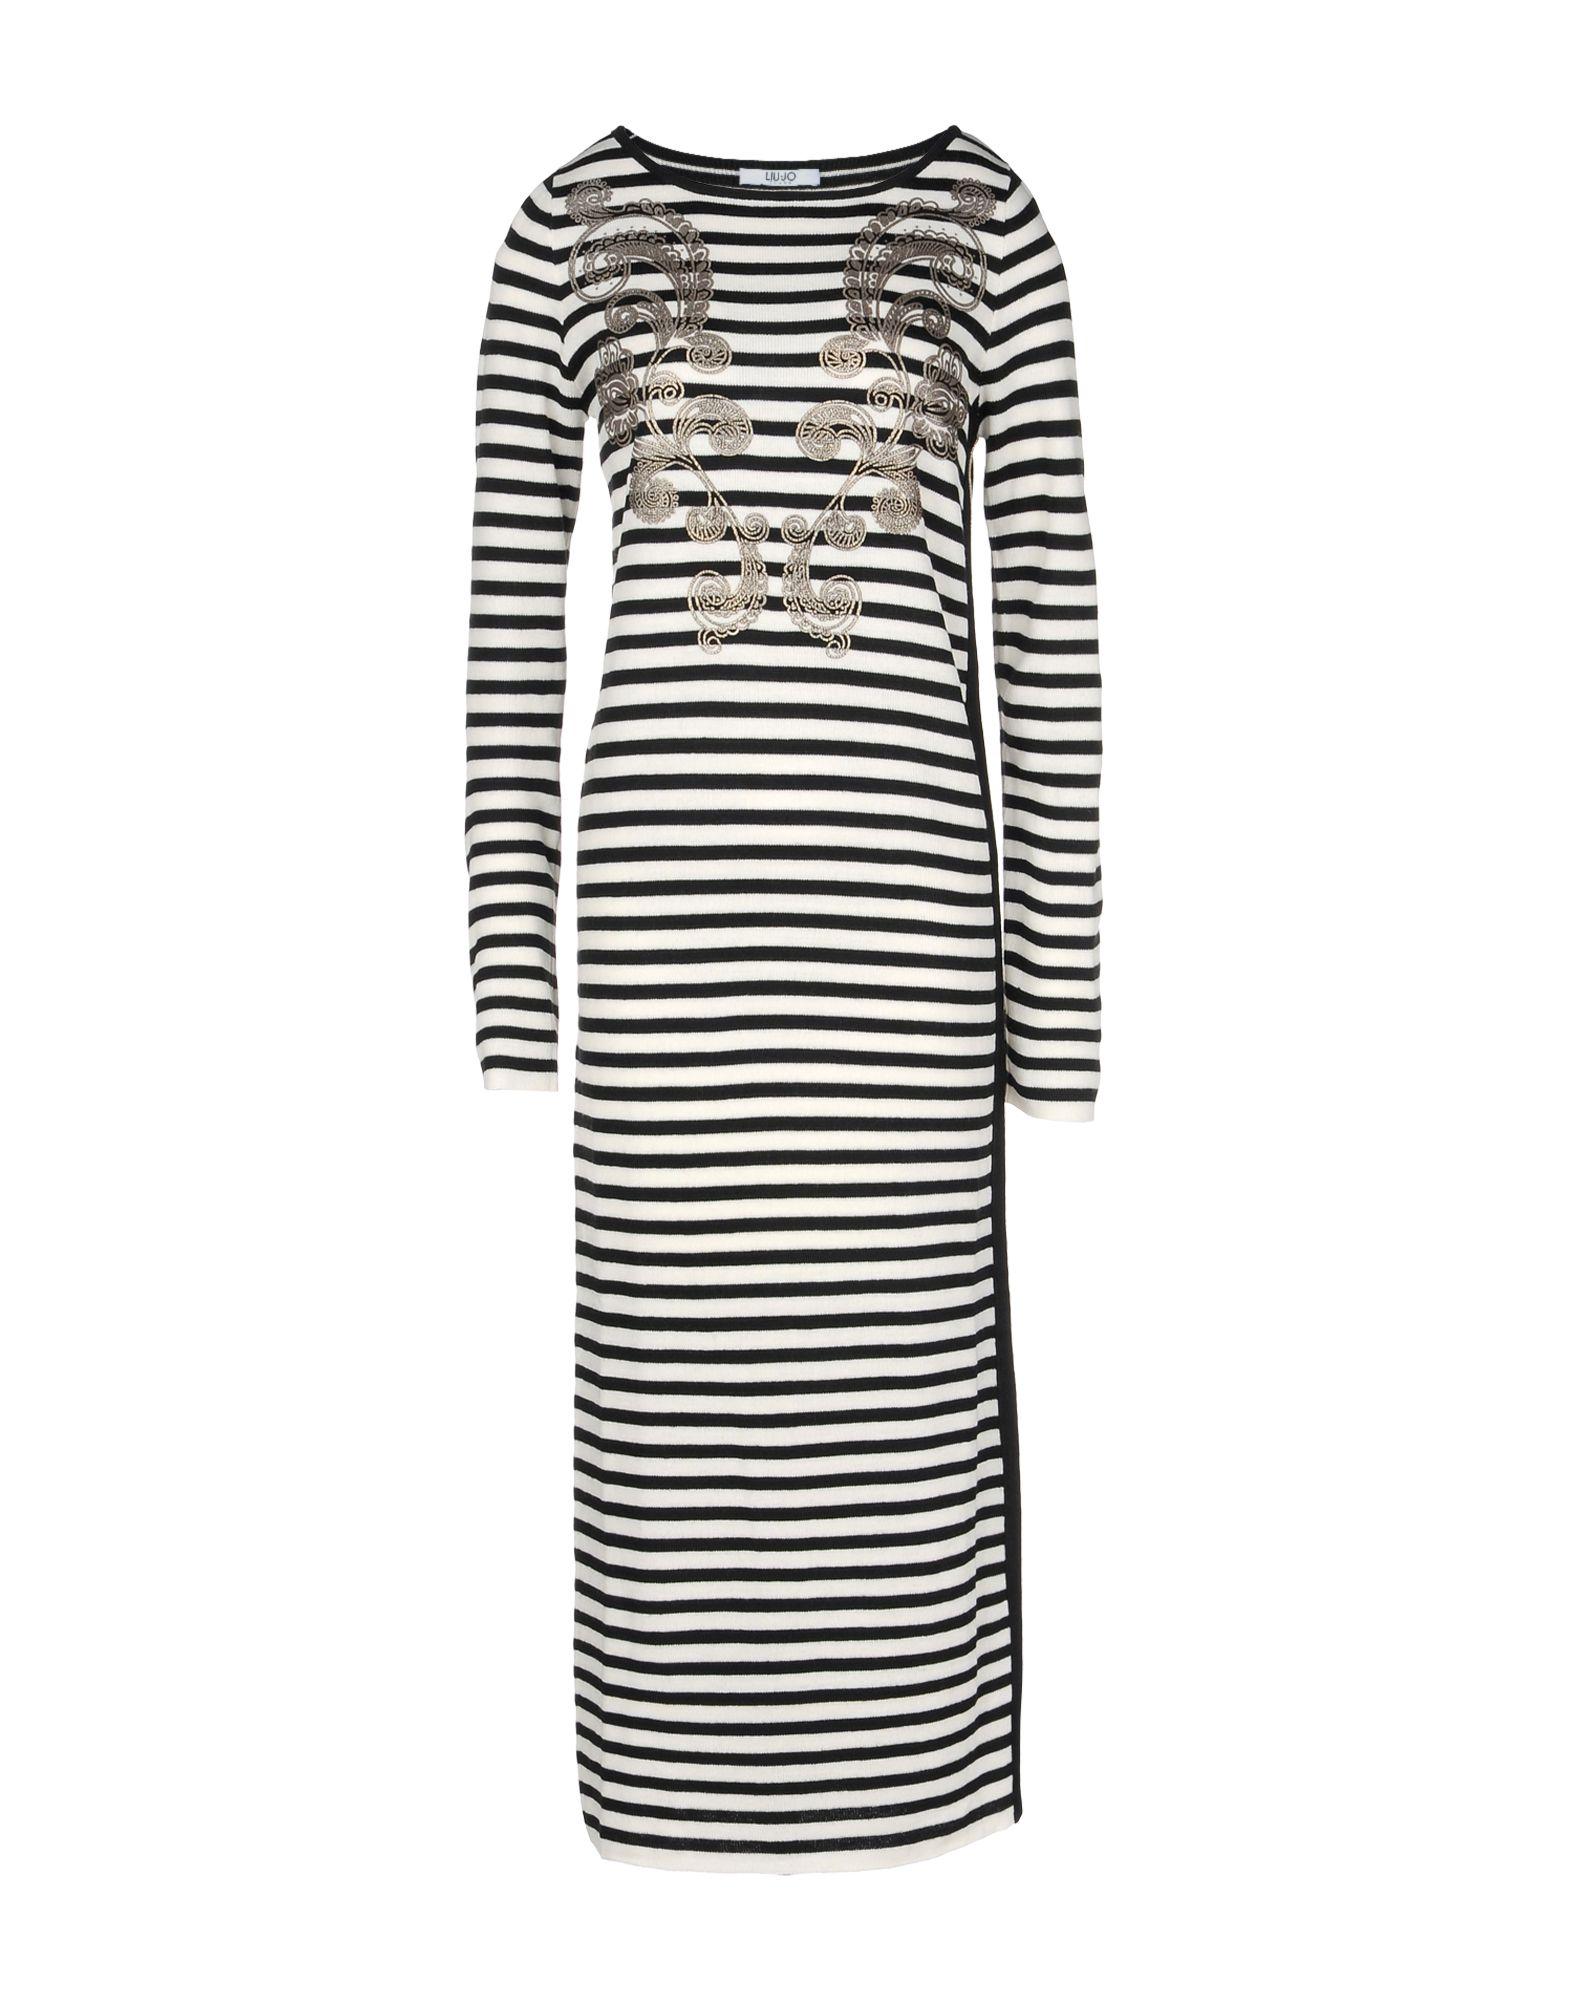 LIU •JO JEANS Платье длиной 3/4 lisa corti платье длиной 3 4